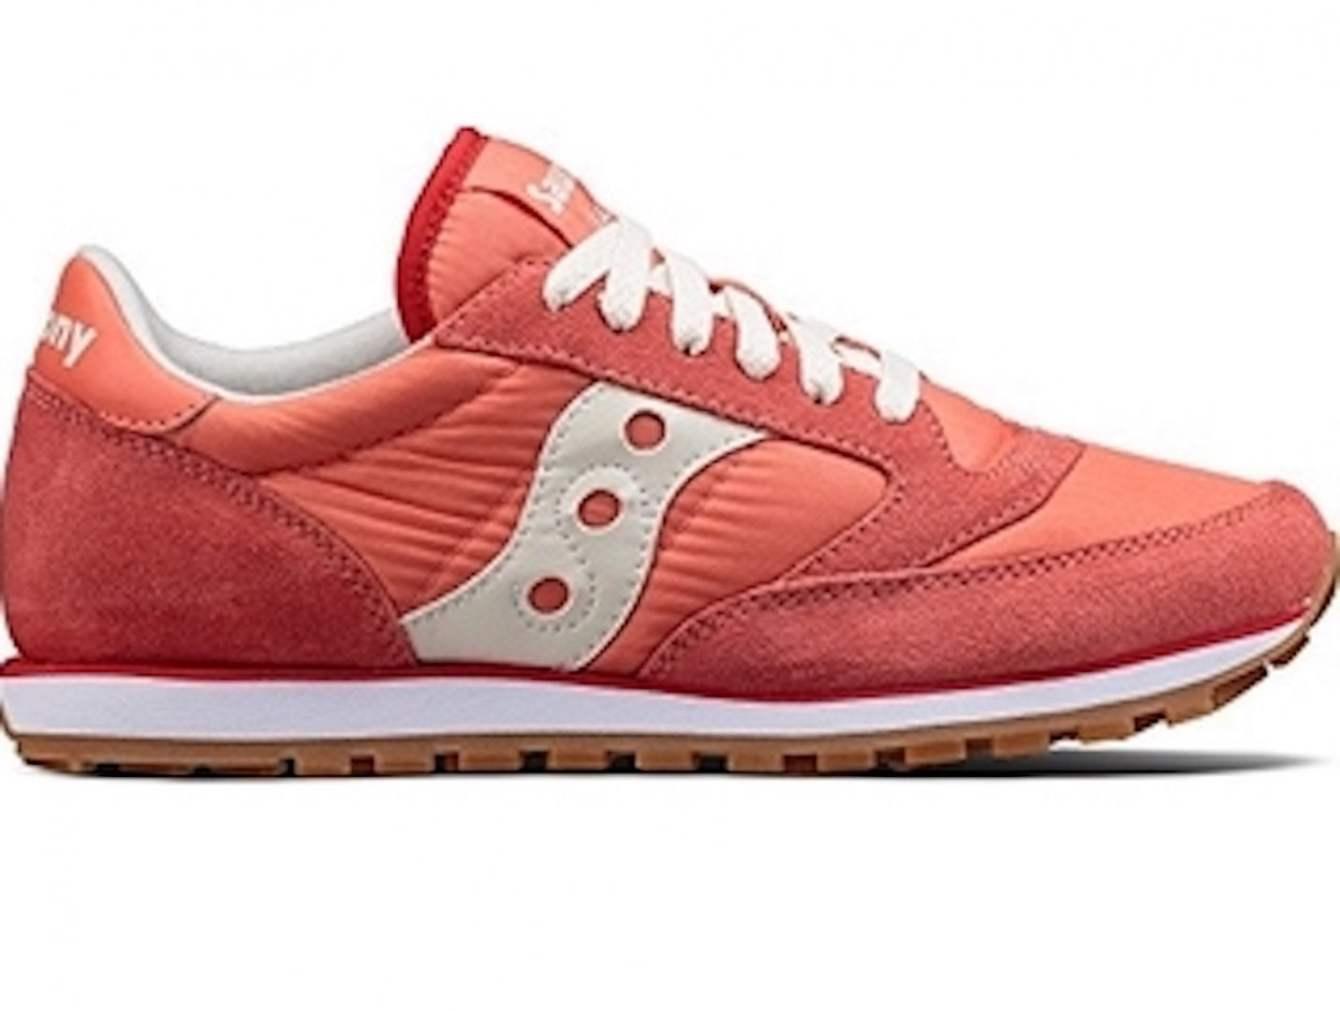 # In Your Shoes 023:2019年代表色「活珊瑚橘」,先從鞋款下手走在時尚前鋒! 13